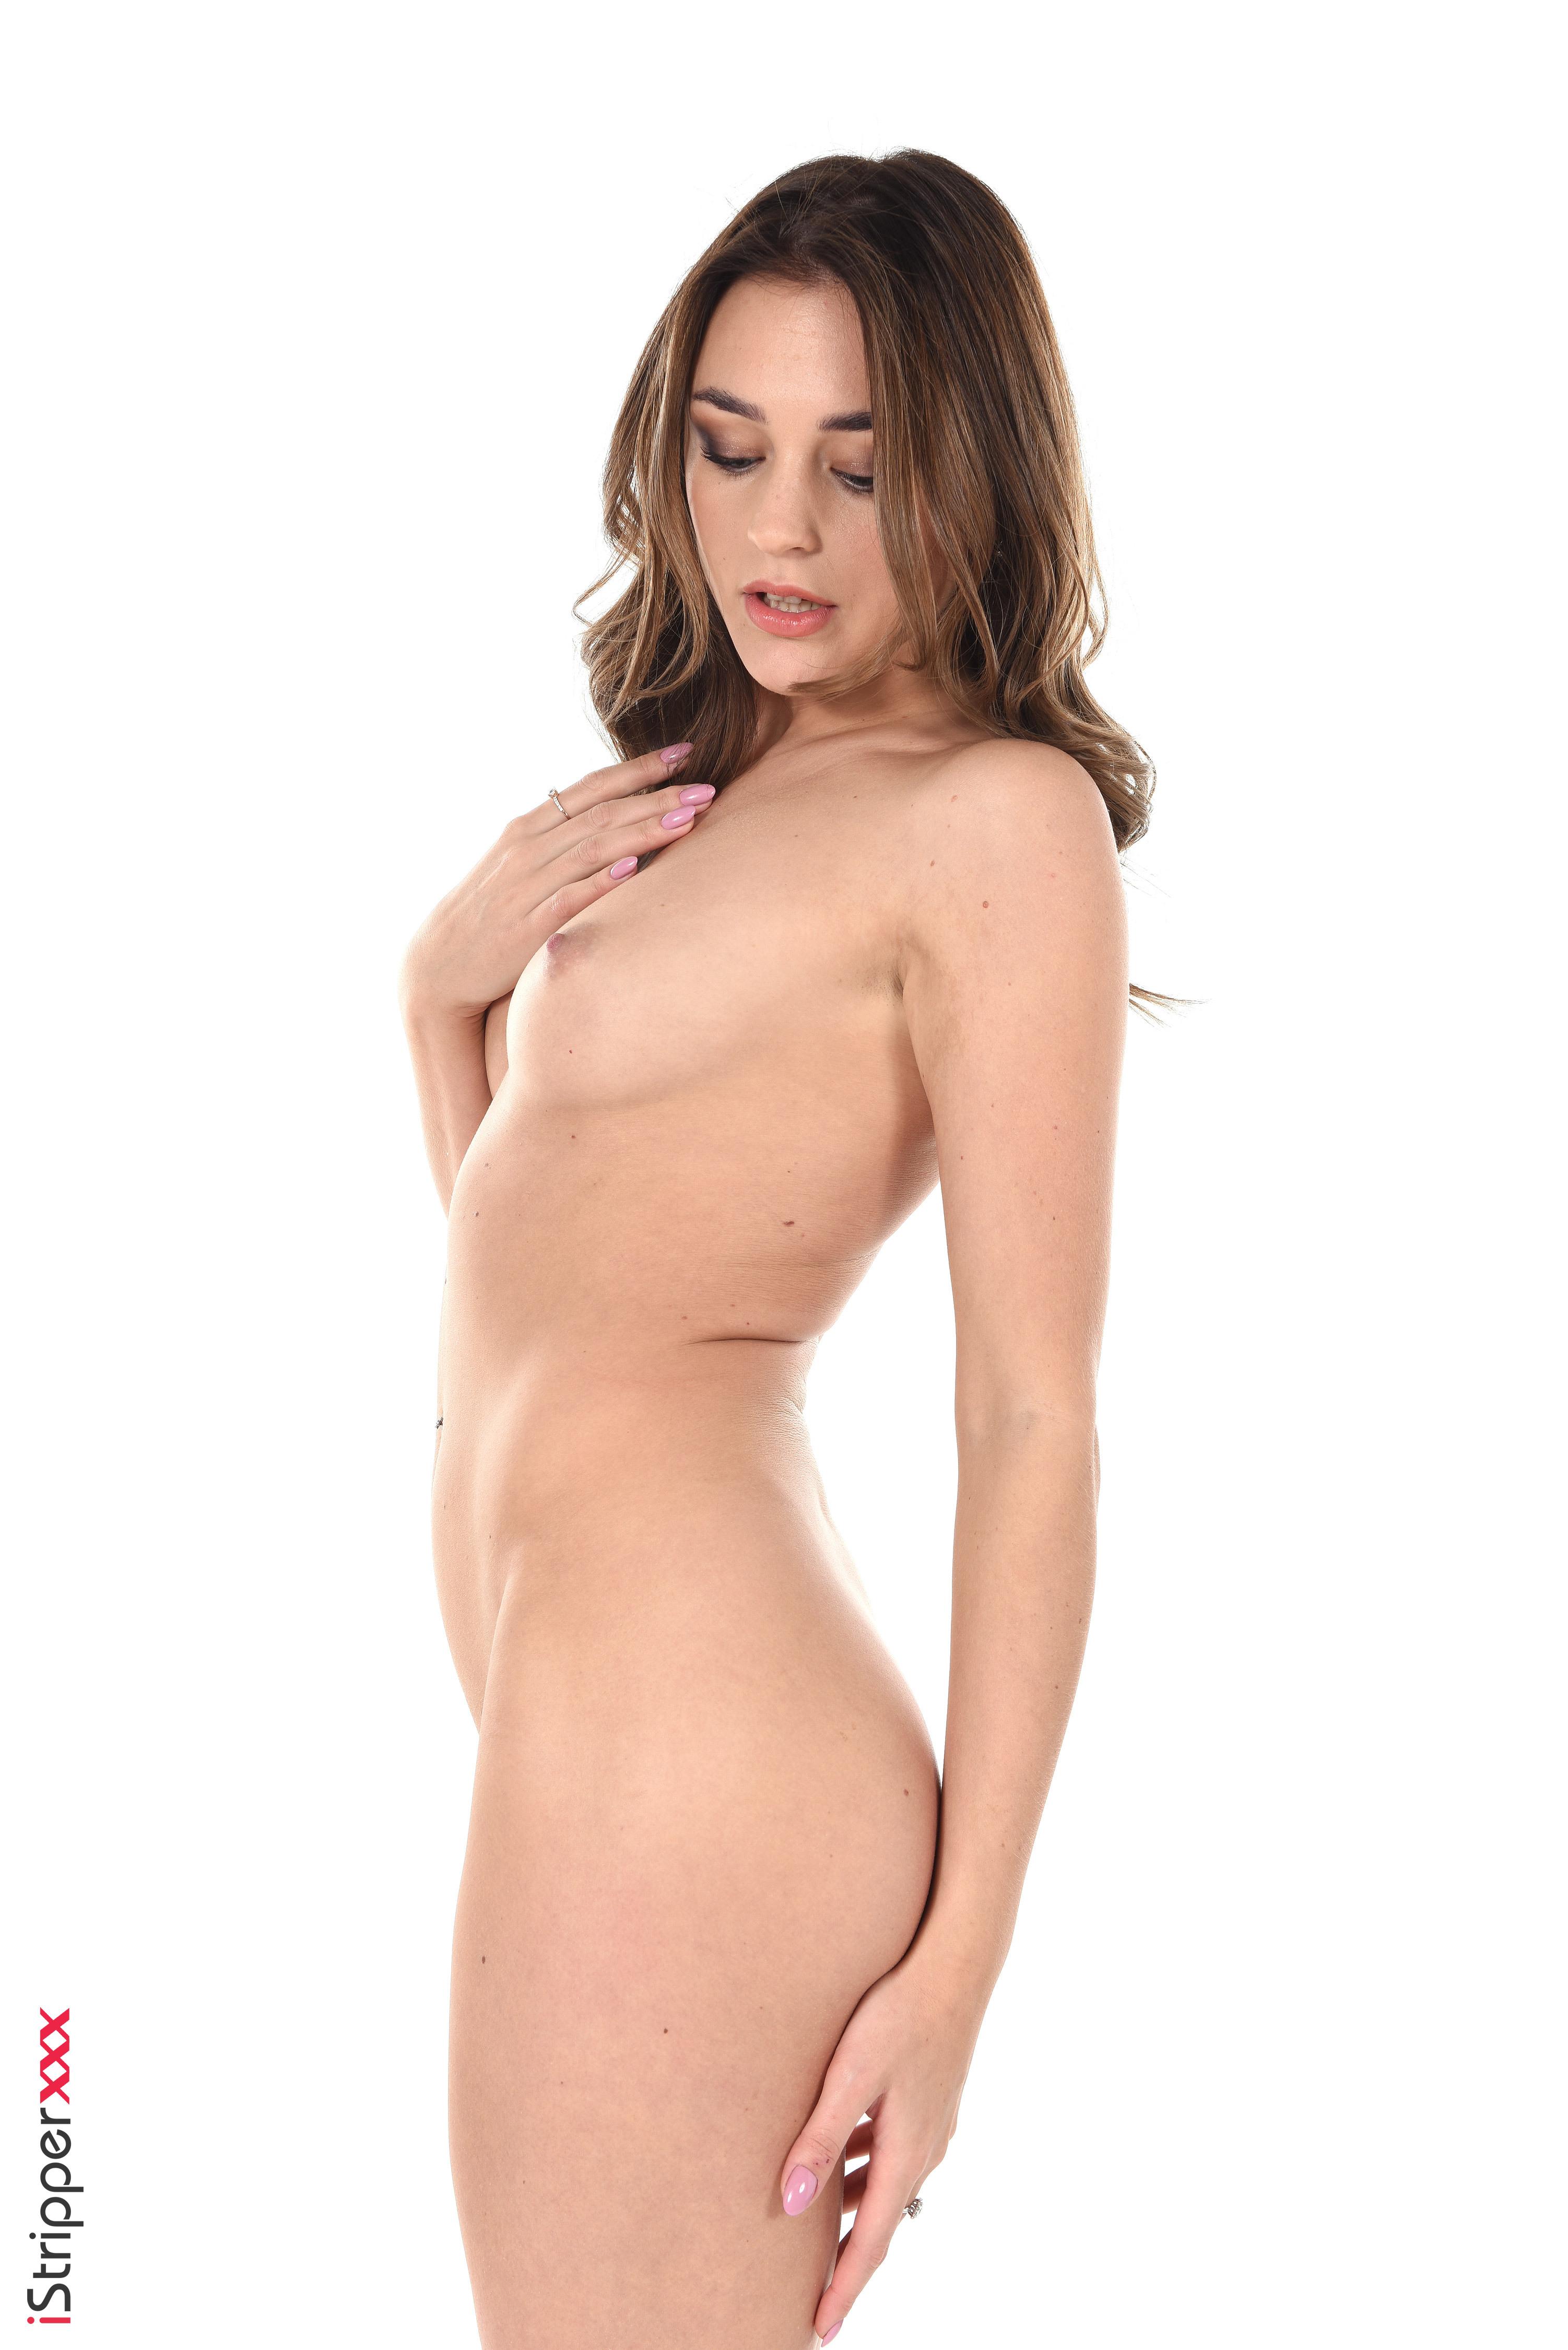 free nude wallpaper